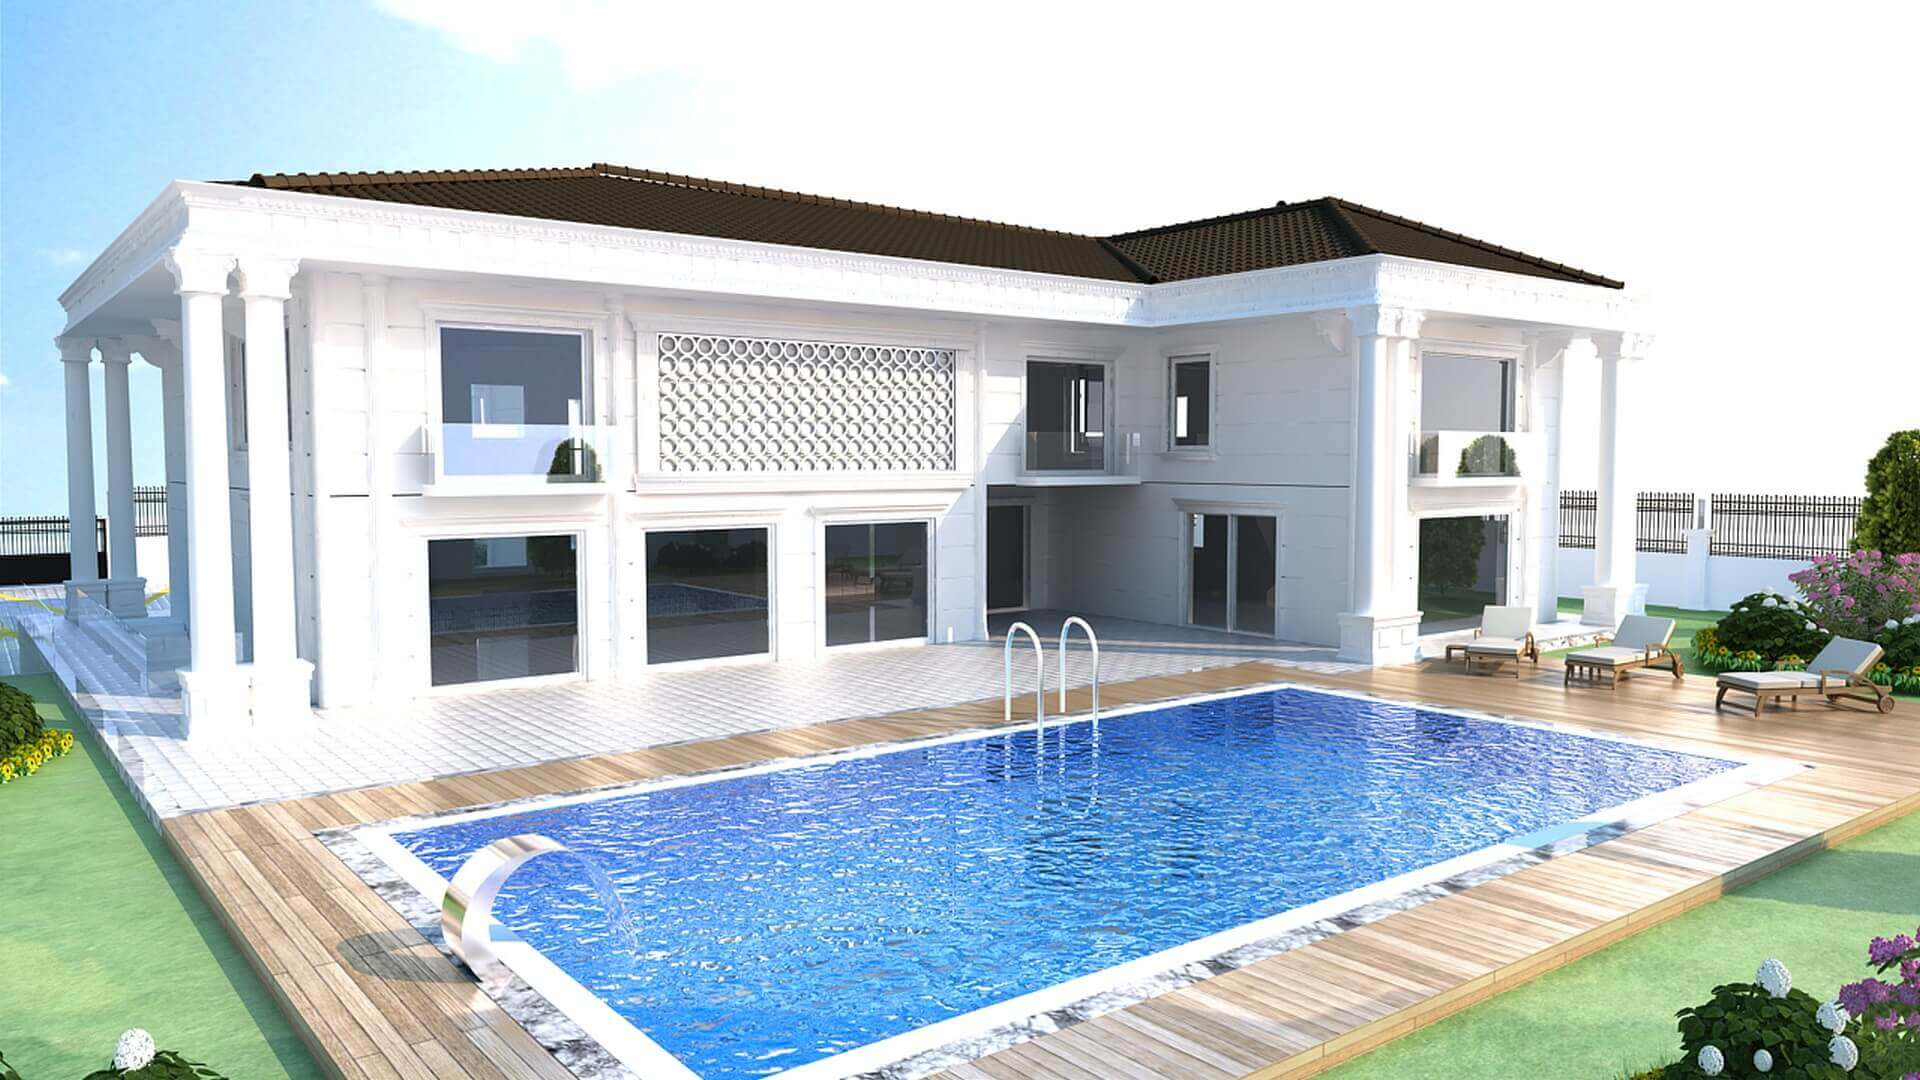 Home design 2891 C. Balta House Residential